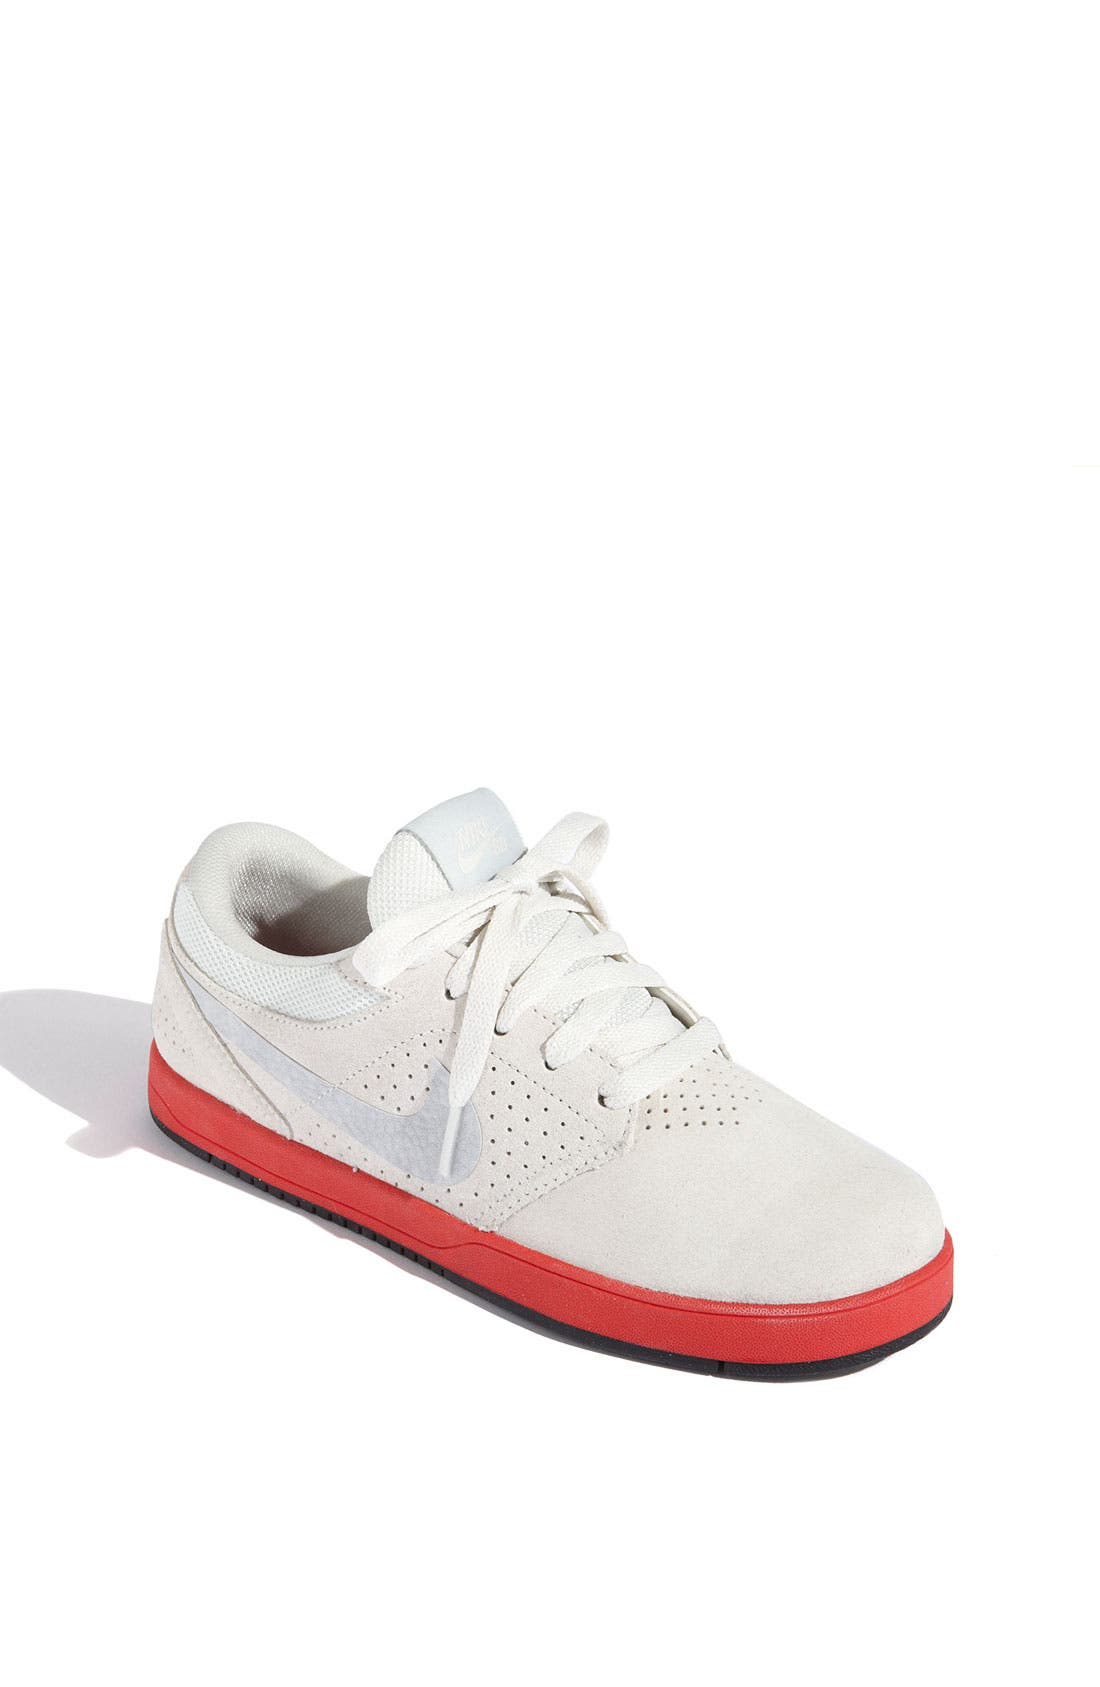 Main Image - Nike 'Paul Rodriguez 5' Skate Shoe (Little Kid & Big Kid)